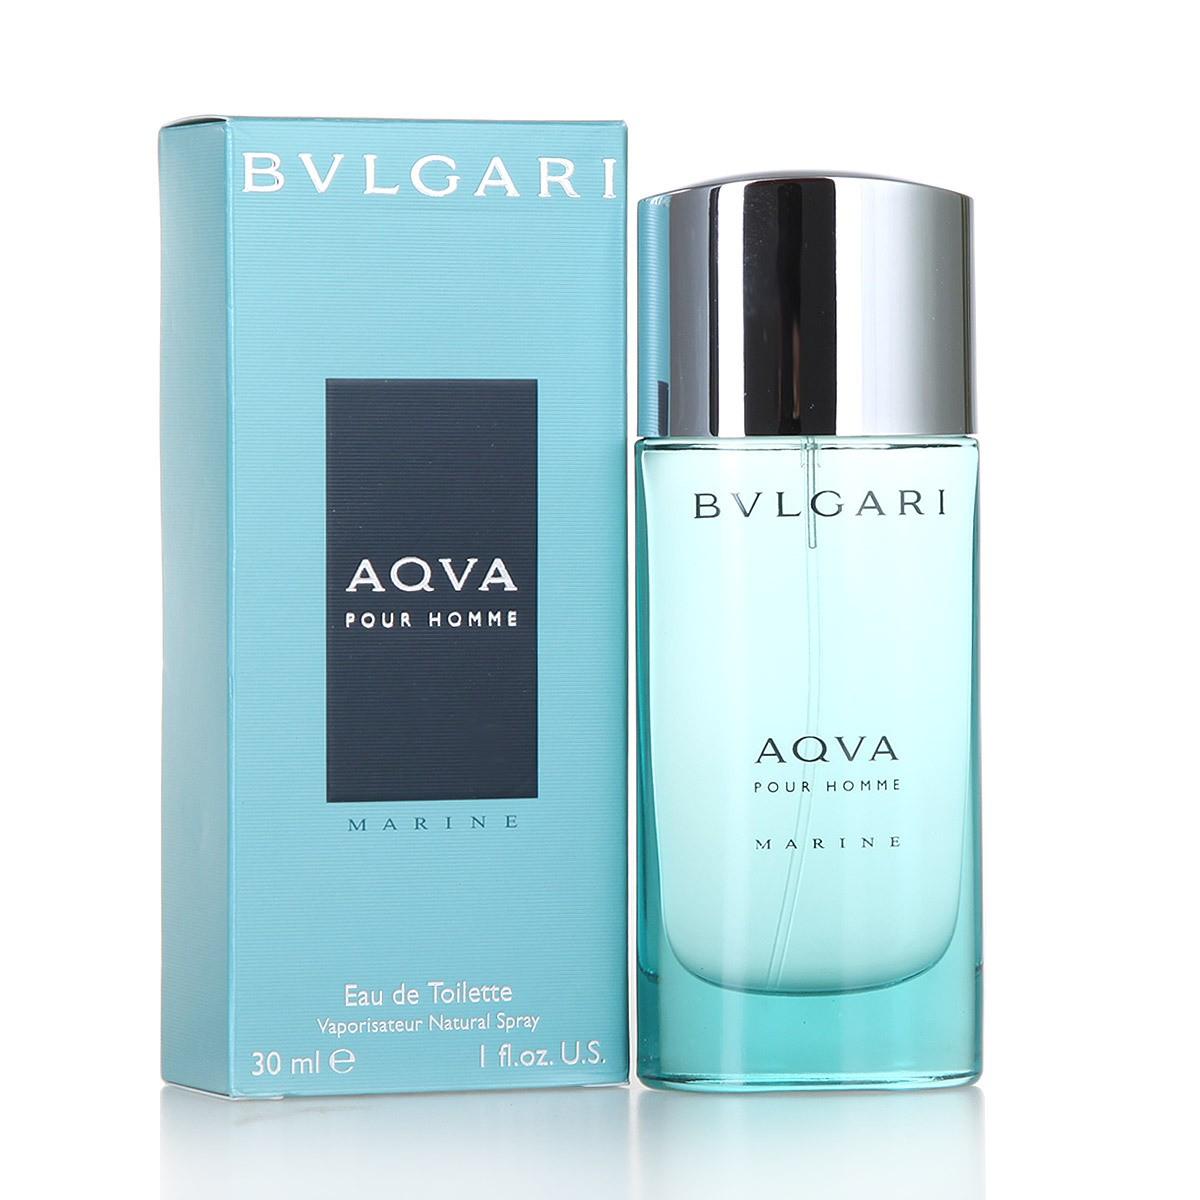 Bvlgari Aqva pour Homme Marine, 30ml, Toaletní voda